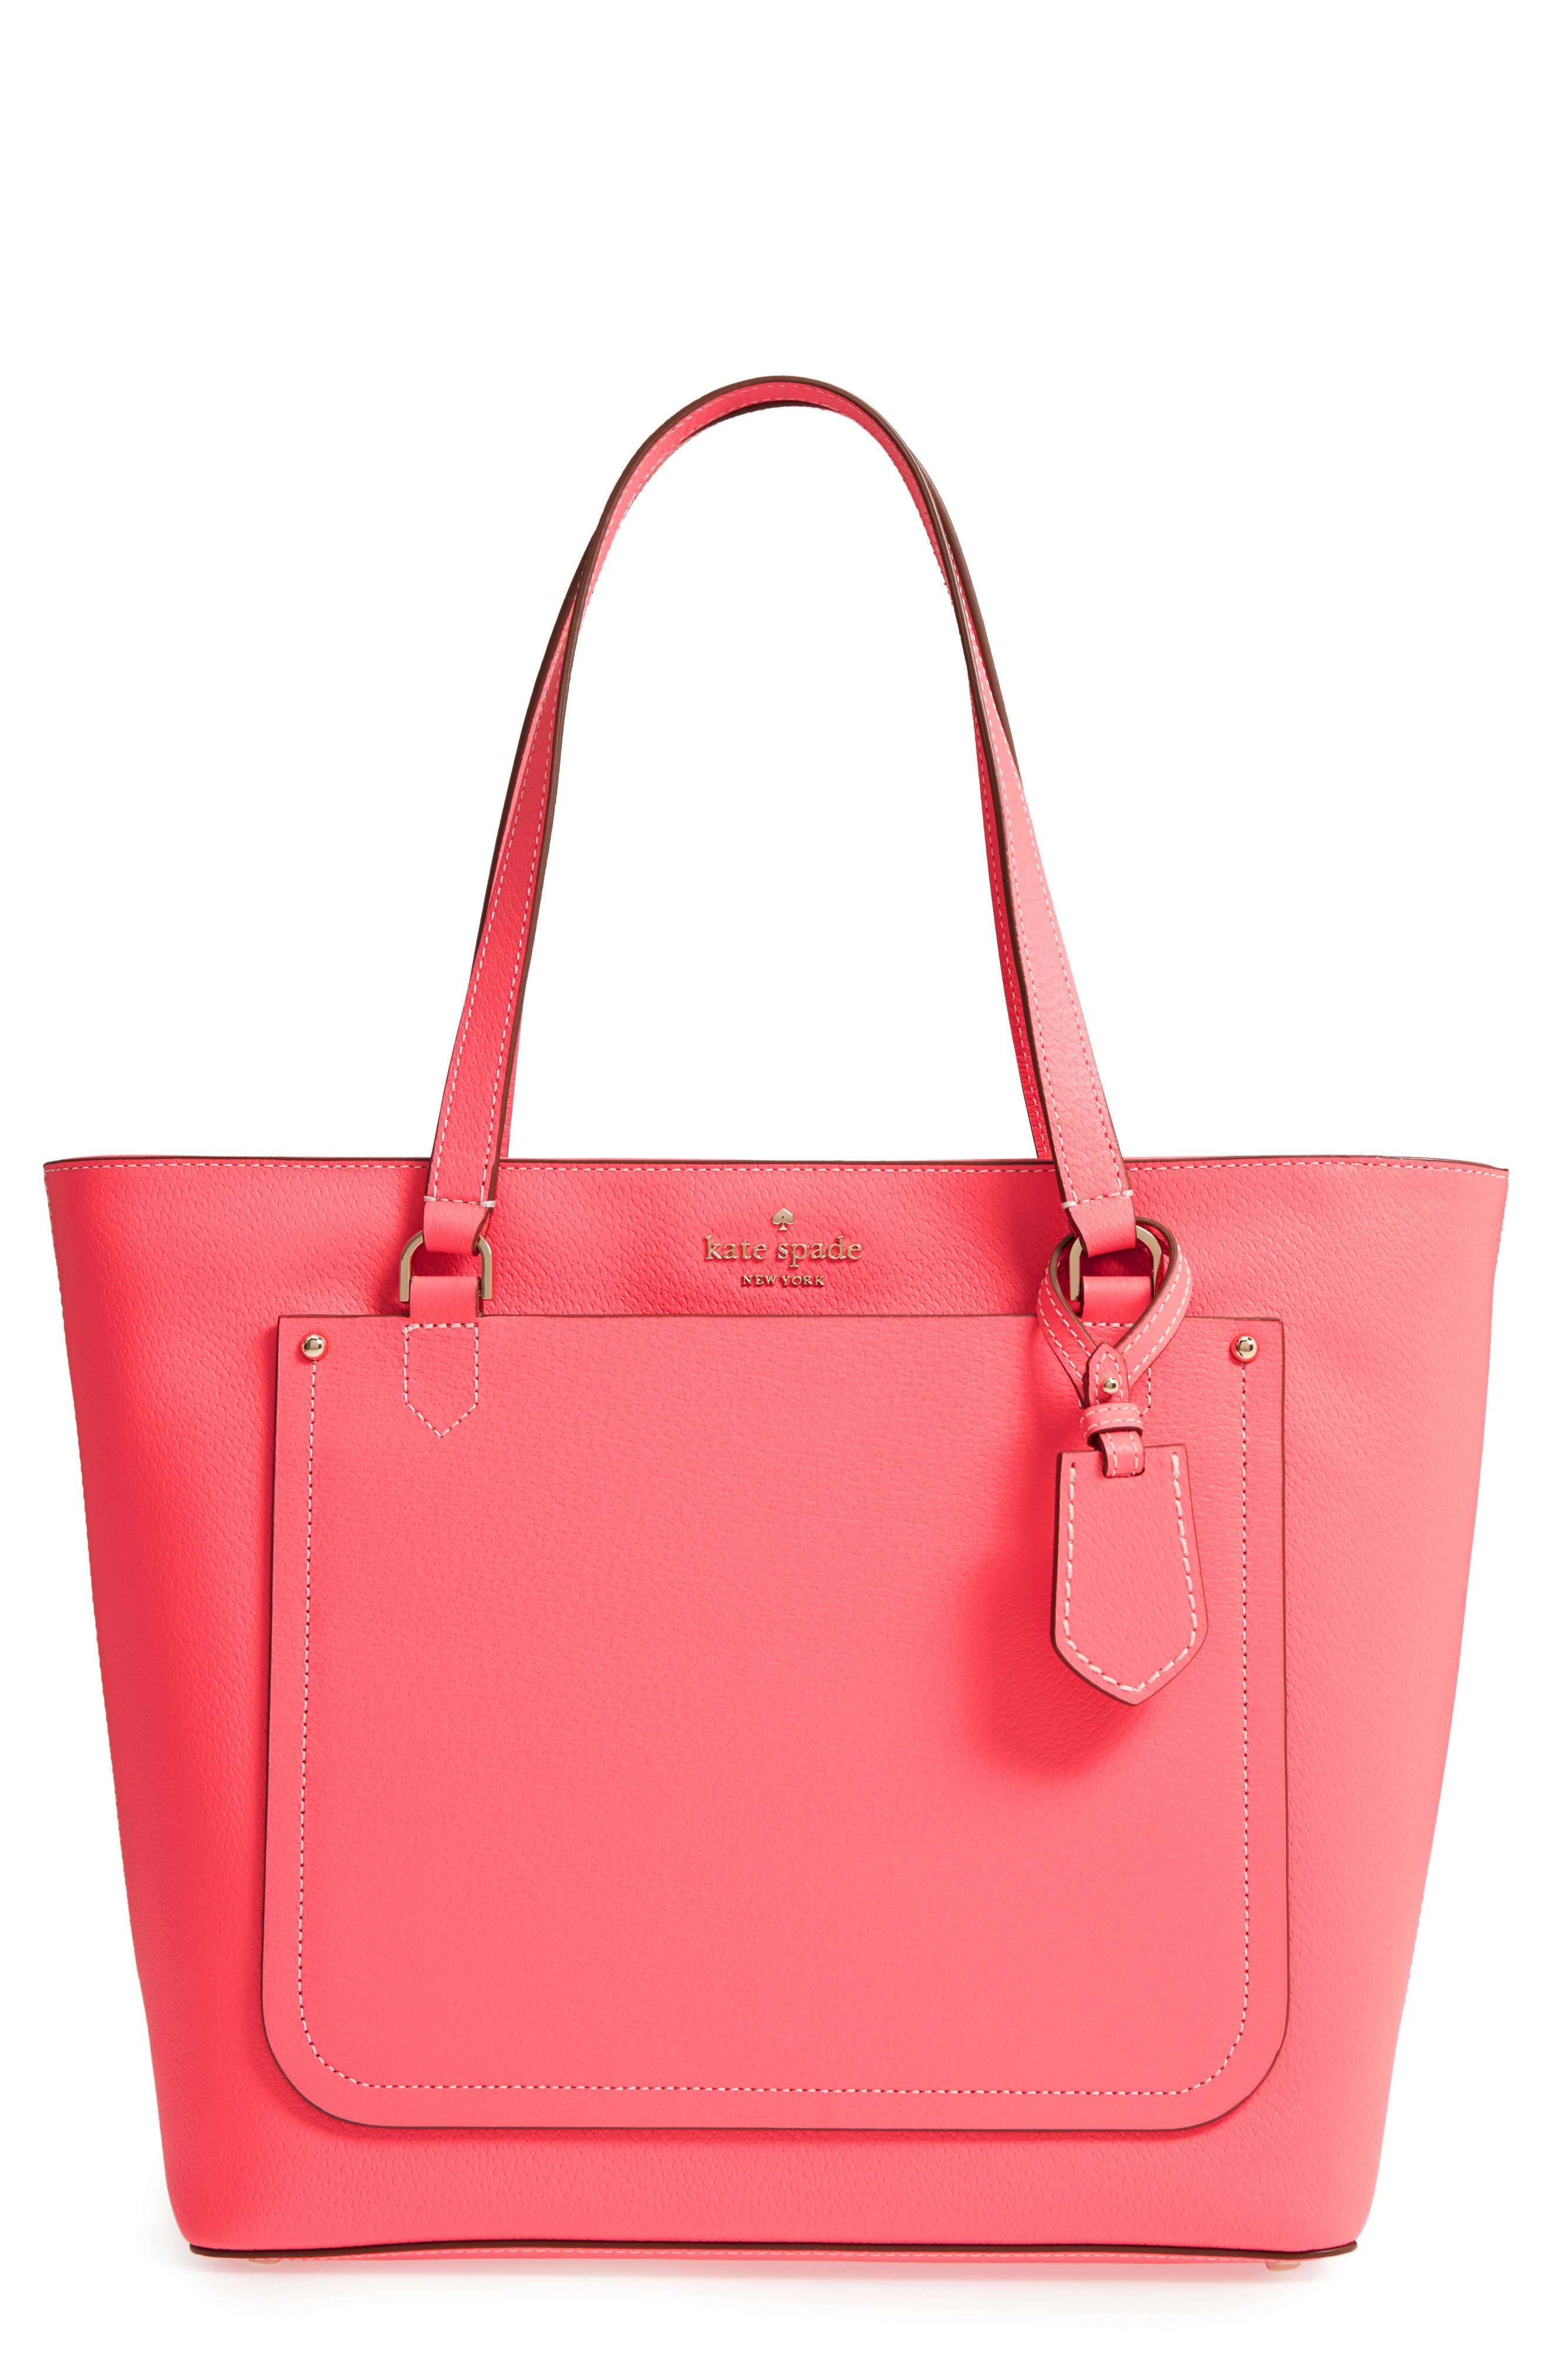 thompson street - kimberly leather tote,                             Main thumbnail 1, color,                             Bright Flamingo